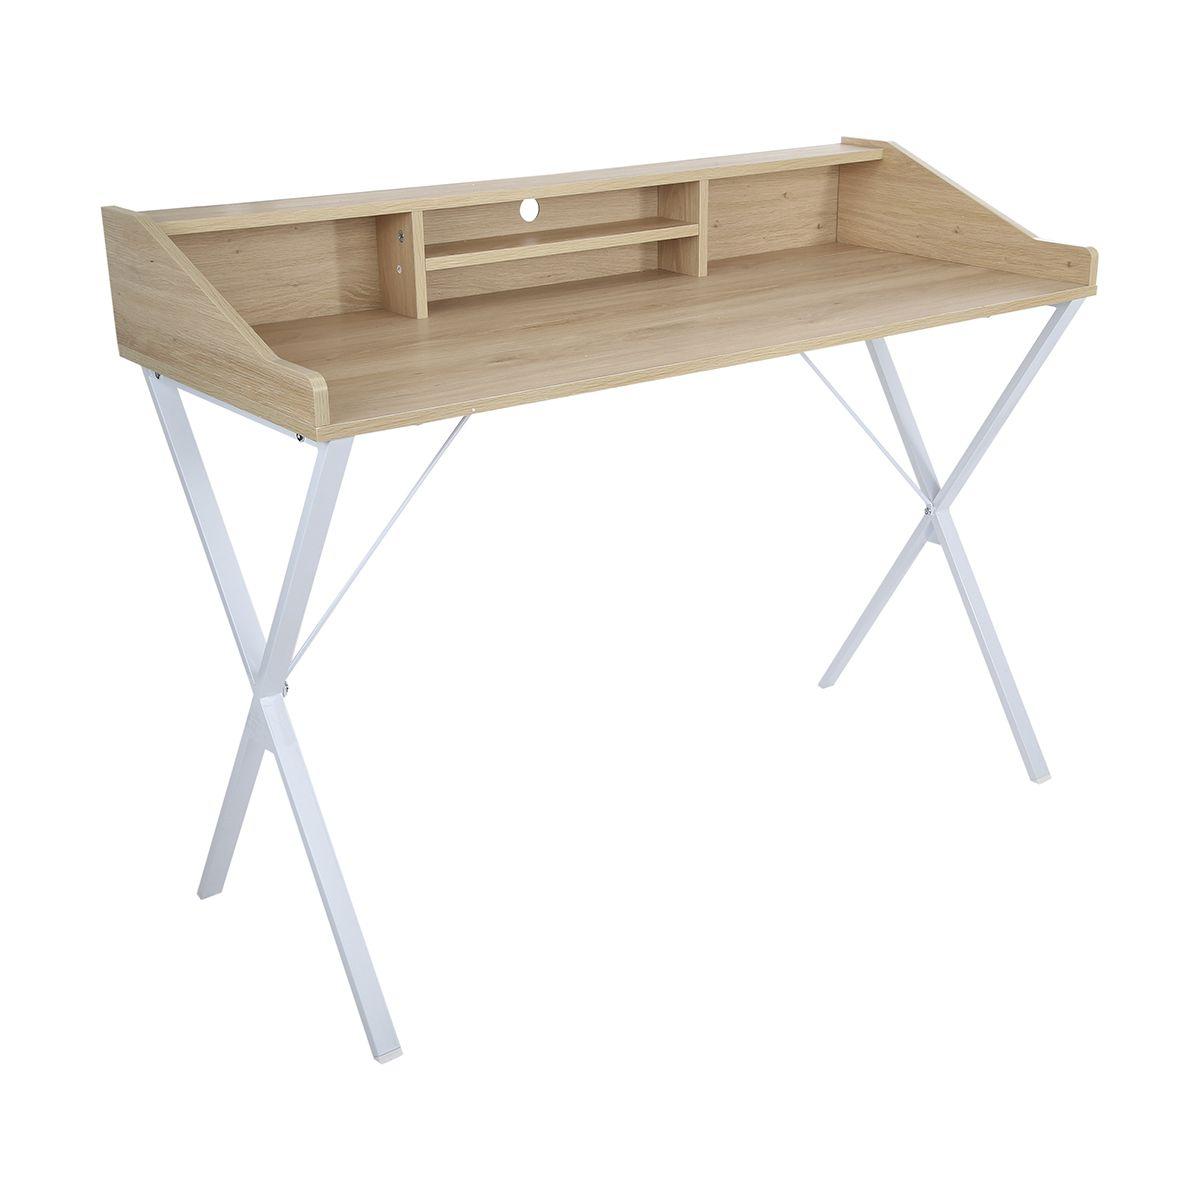 Scandi Tiered Desk Kmart 60 Walnut Desks Office Desk Zen Desk